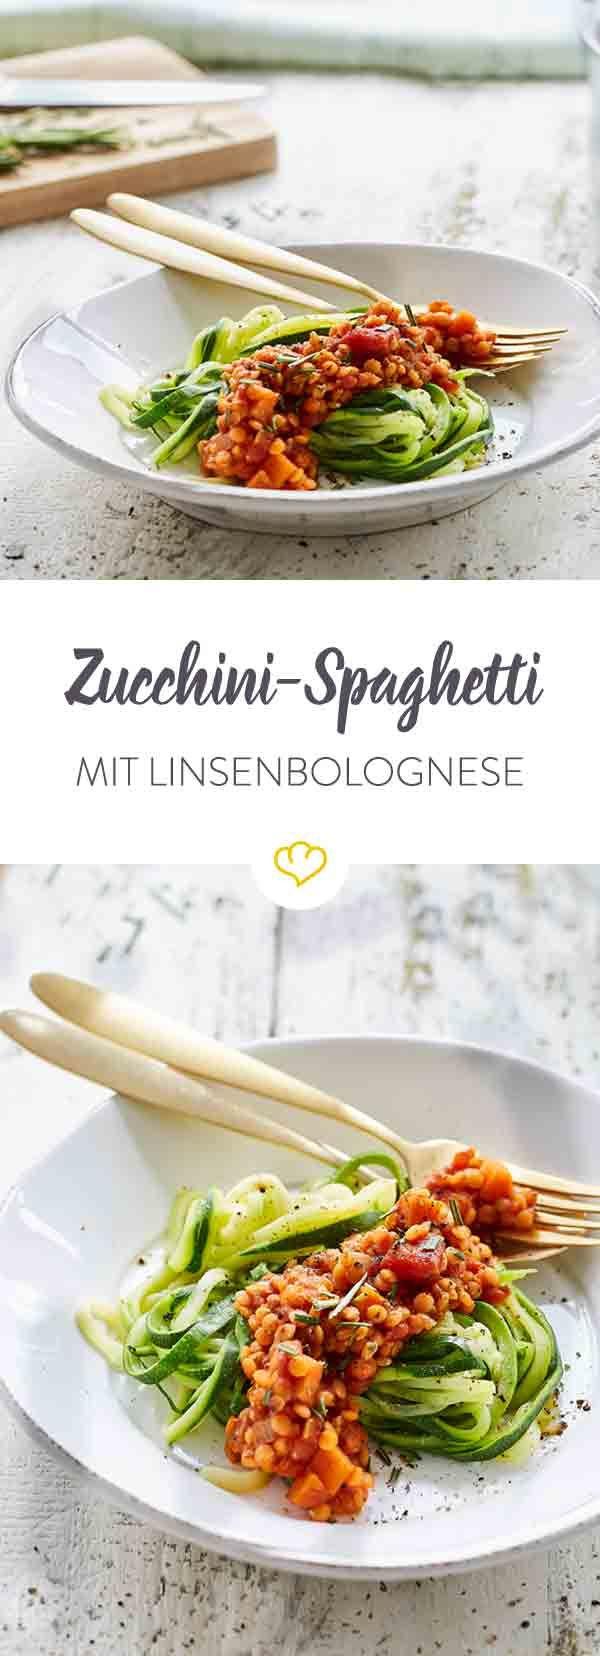 Photo of Zucchini spaghetti with vegan lentil bolognese